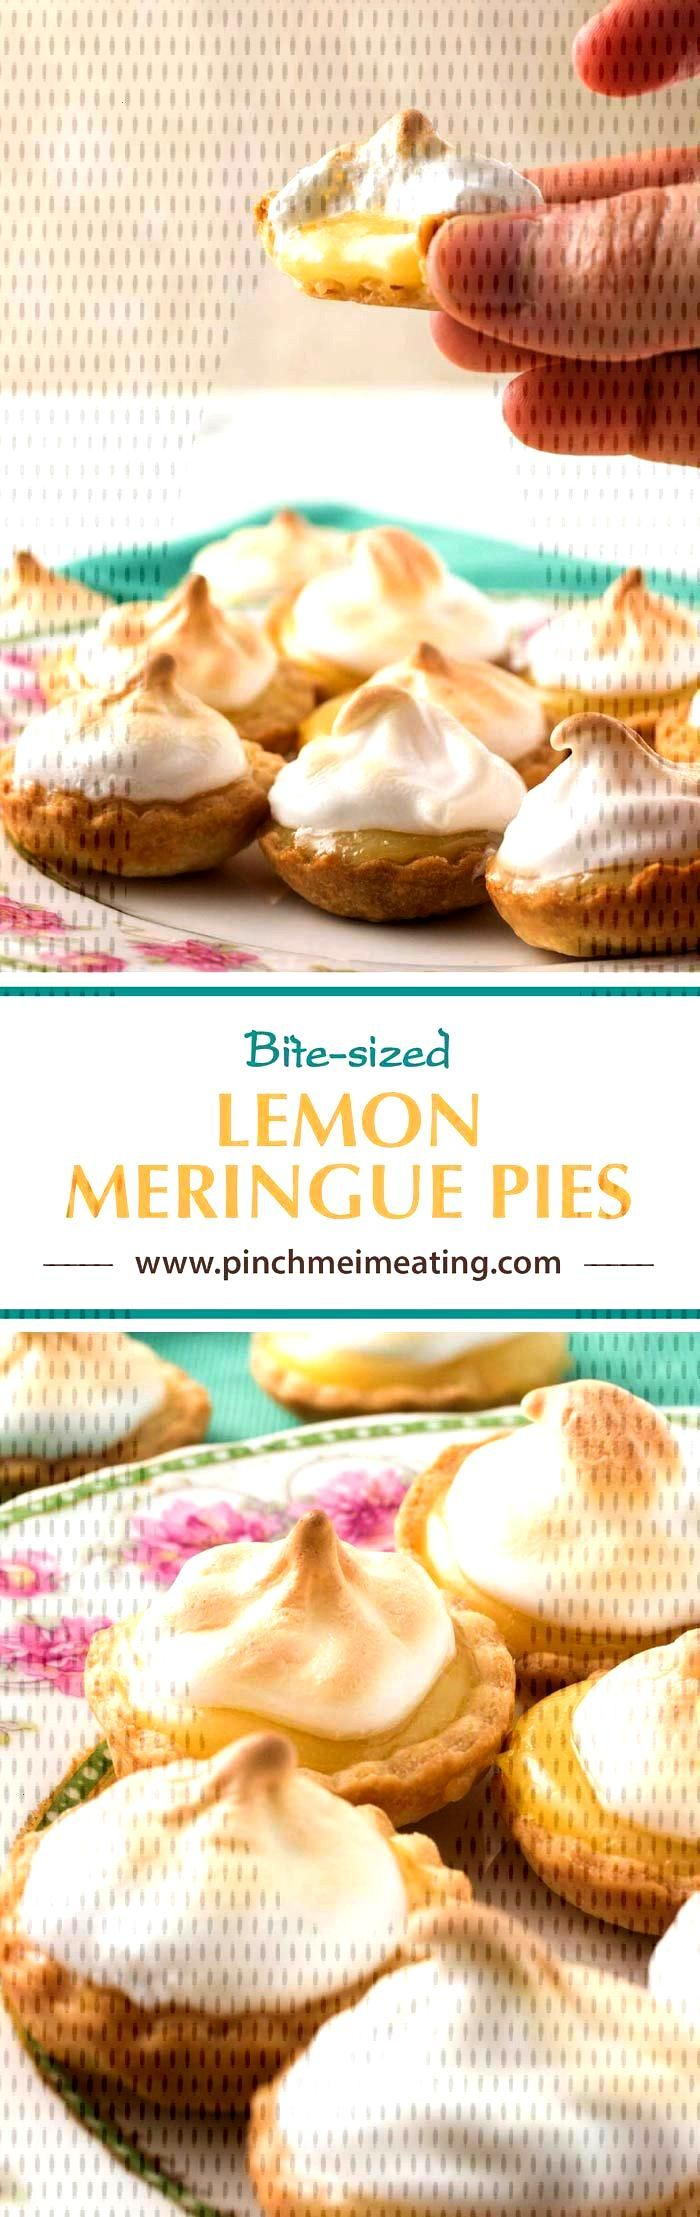 Mini Lemon Meringue Pies | Pinch me, Im eating! -